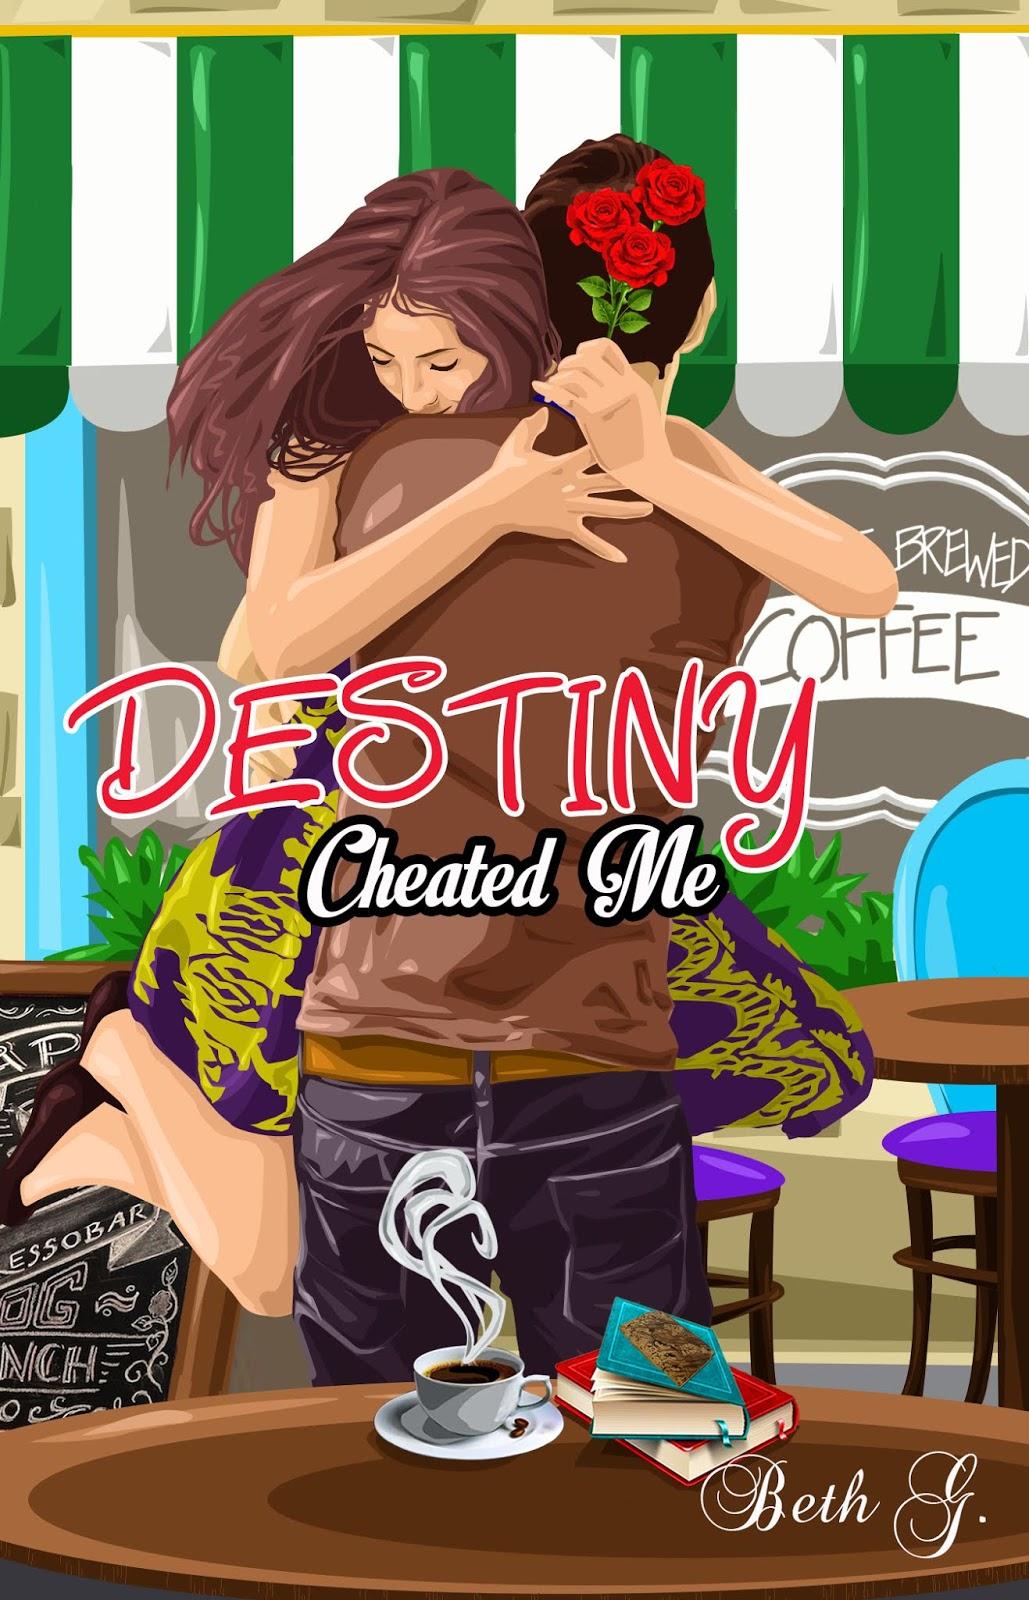 destiny cheated me